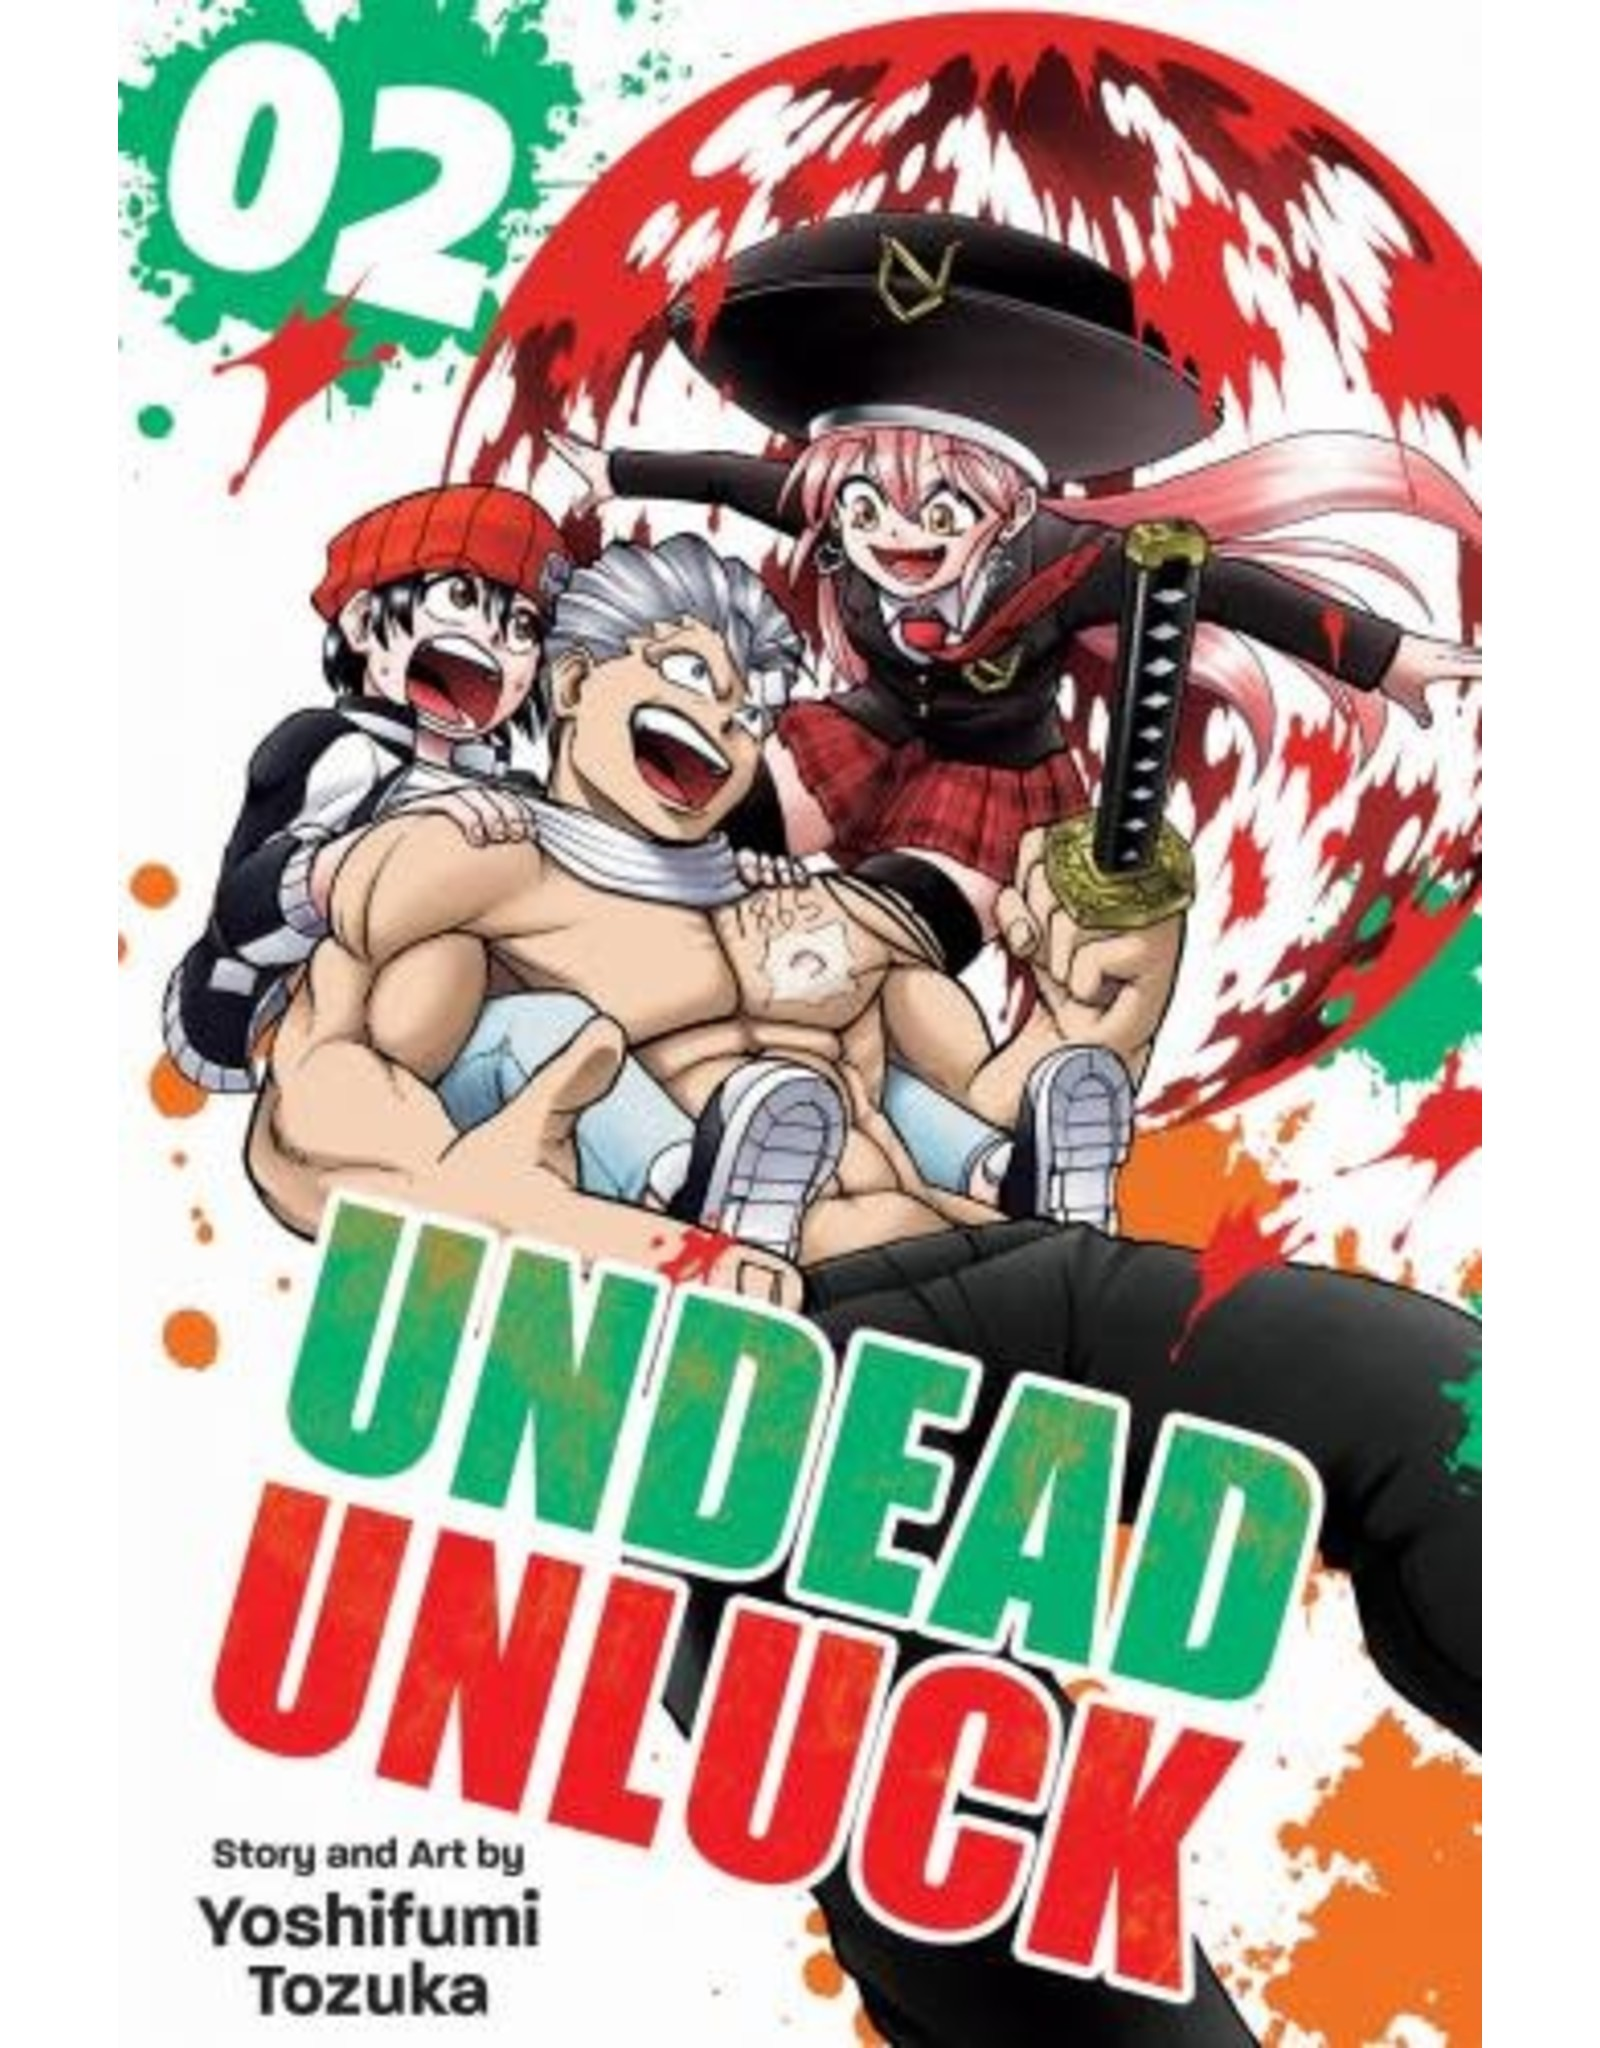 Undead Unluck 2 (Engelstalig) - Manga